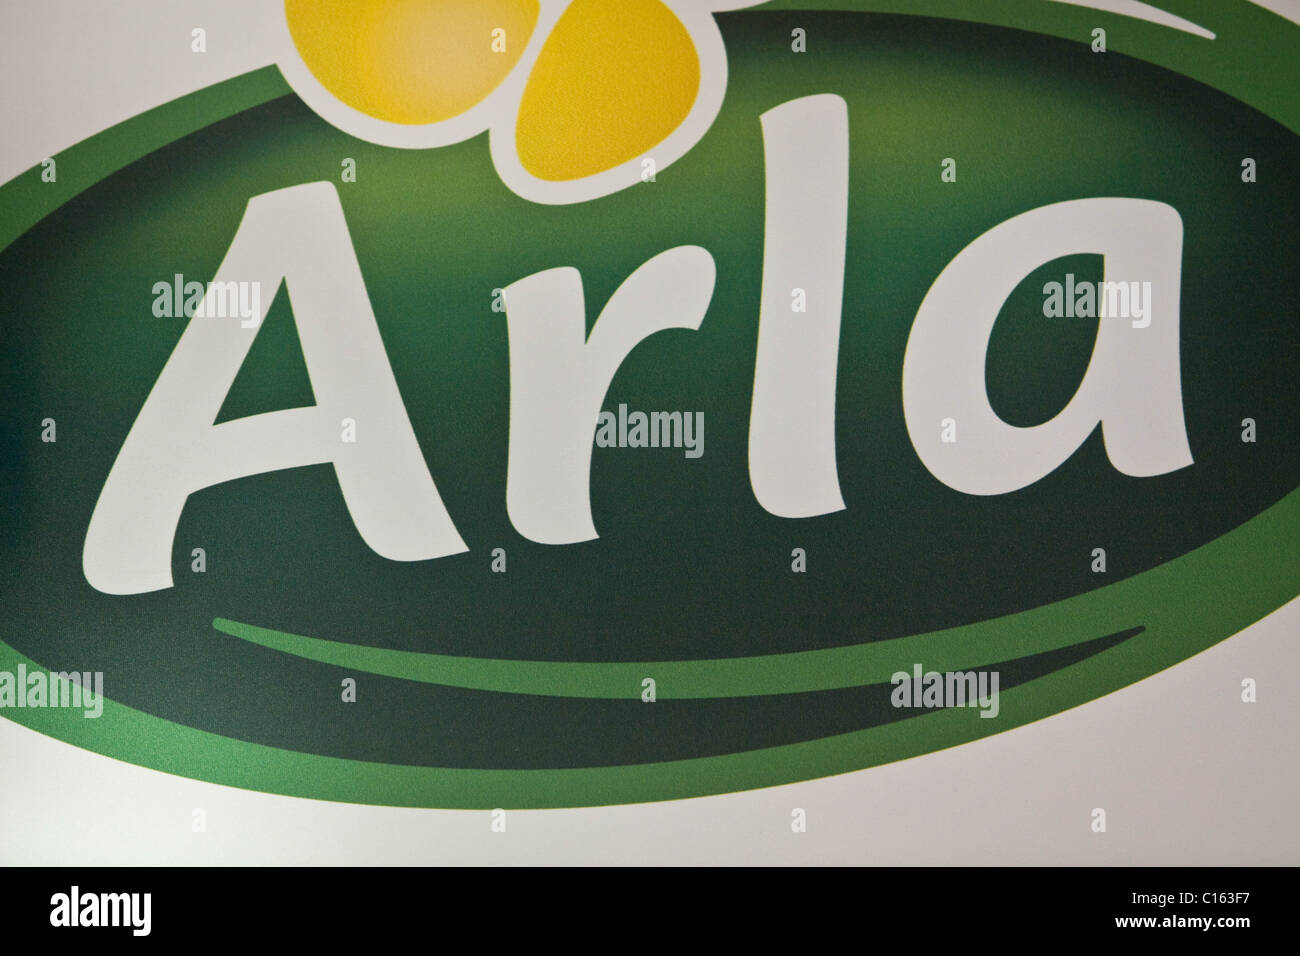 Arla Foods Milk Partnership - Stock Image